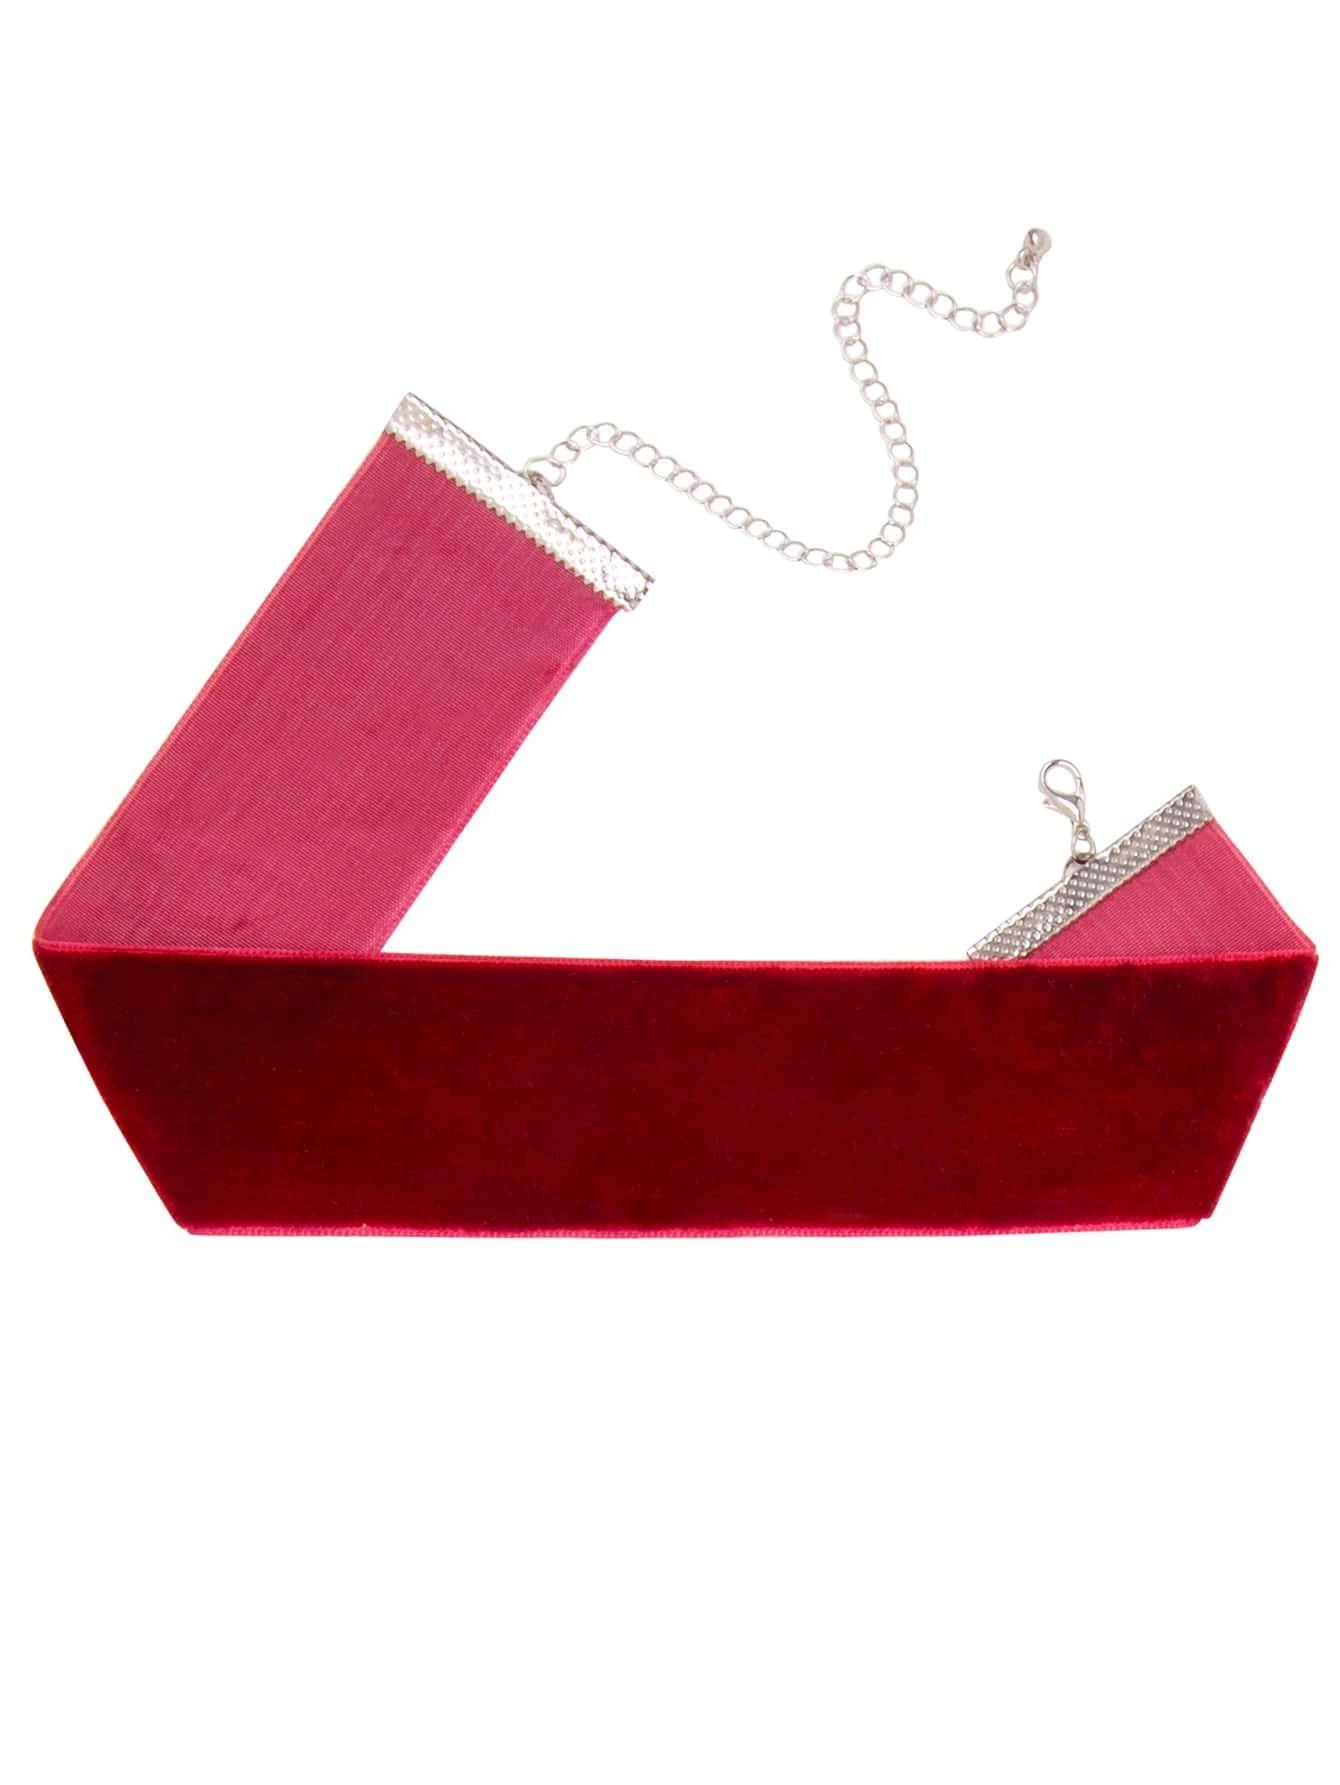 necklacenc160823308_2